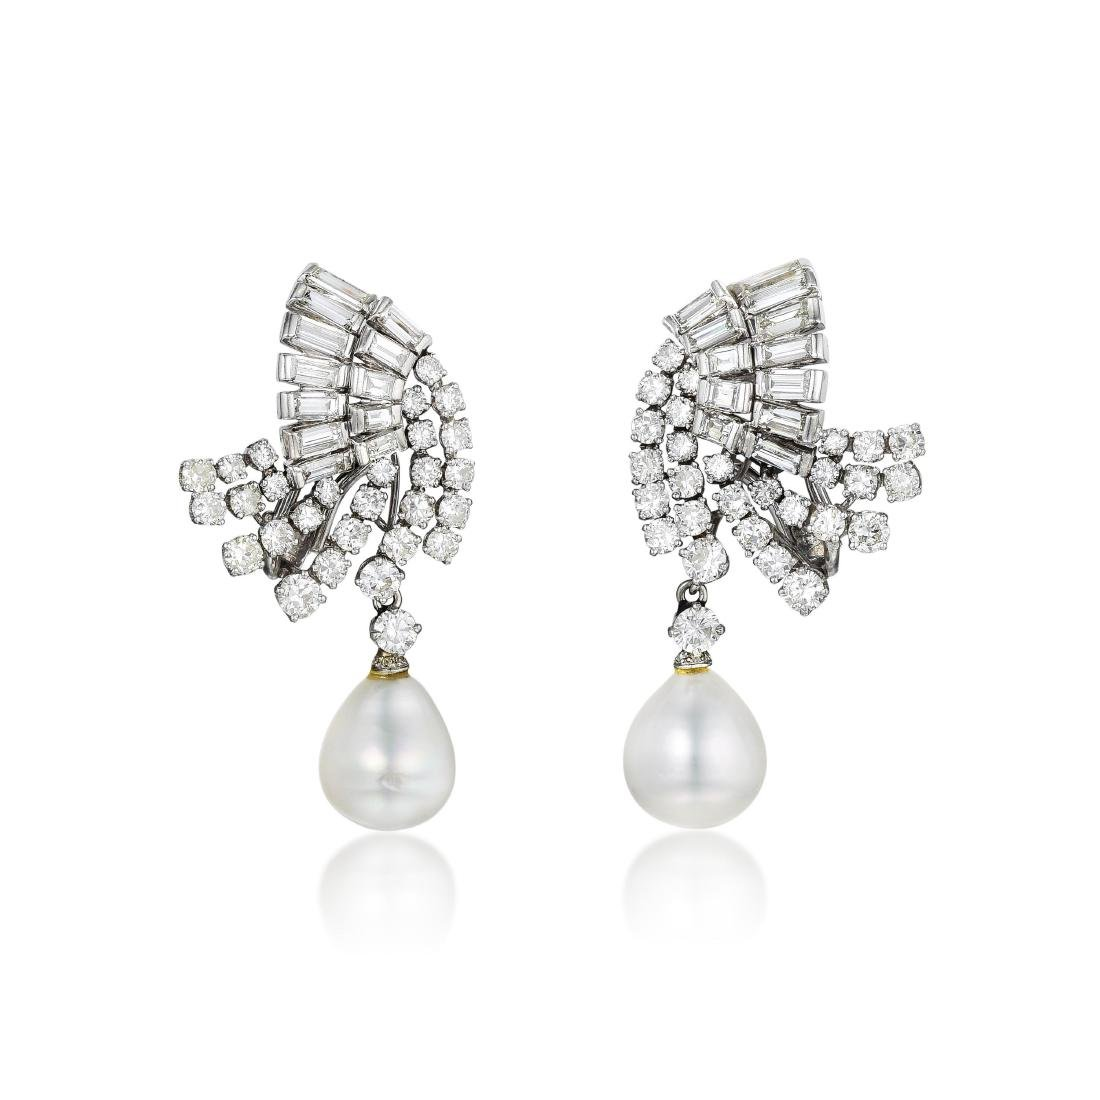 Ruser Diamond and Pearl Drop Earrings